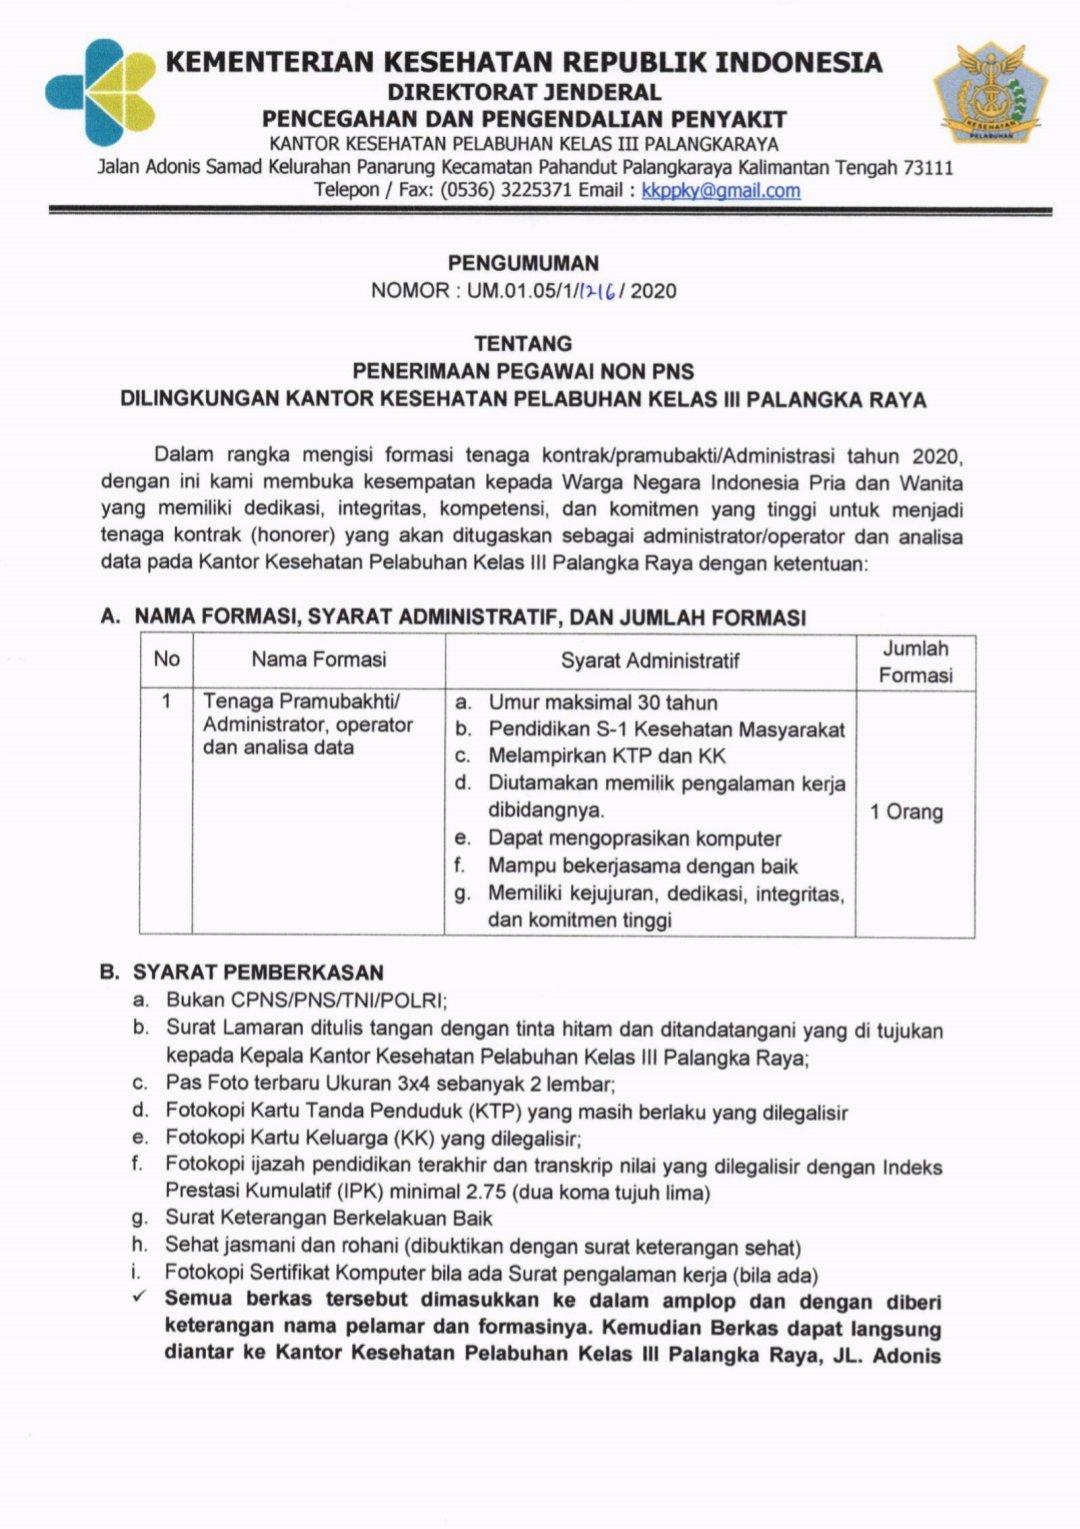 Penerimaan Pegawai Non PNS KKP Kelas III Palangka Raya